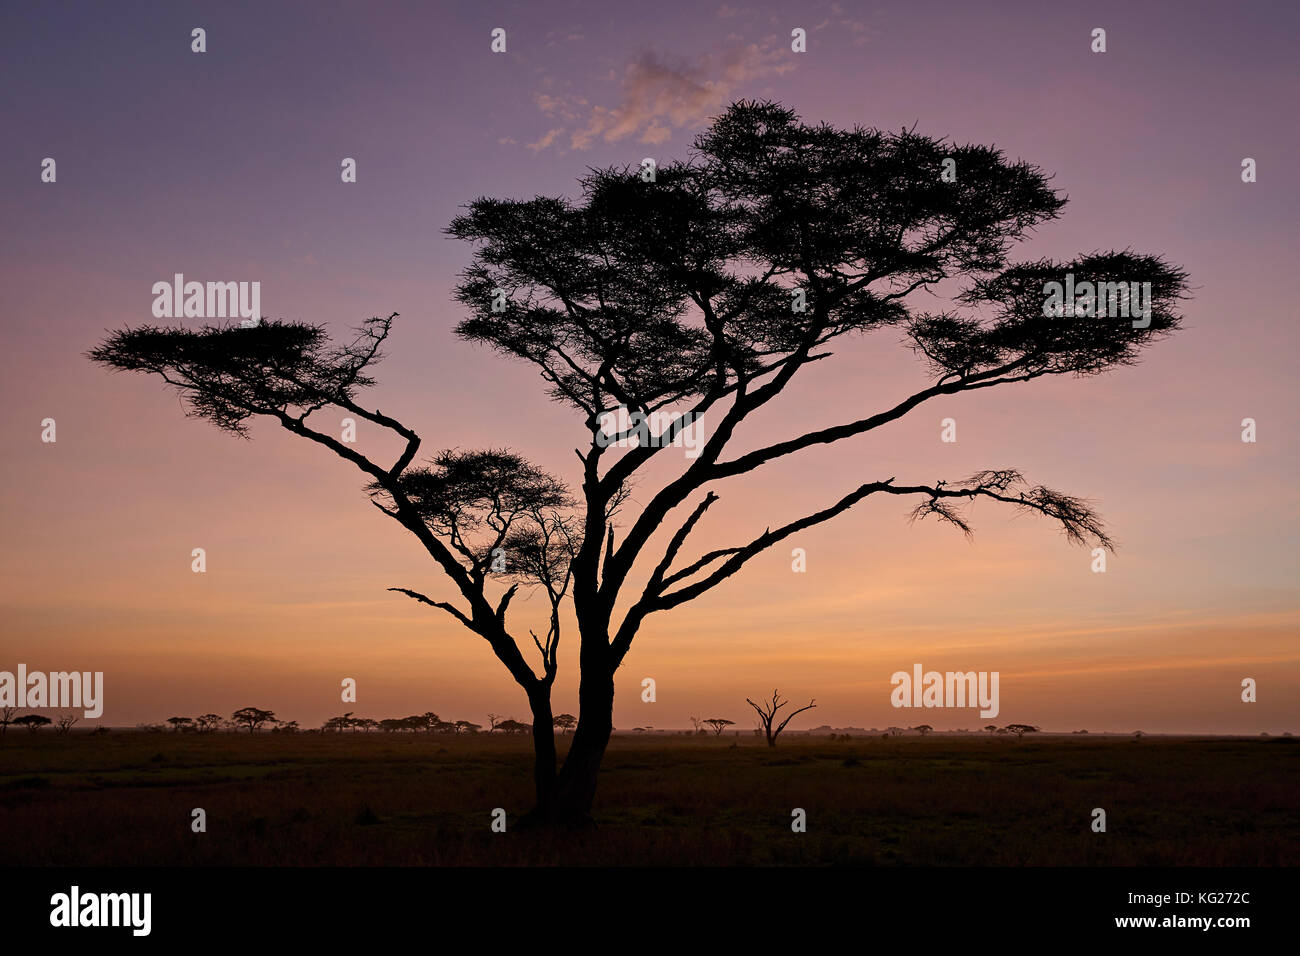 Acacia all'alba, Serengeti National Park, Tanzania, Africa orientale, Africa Immagini Stock